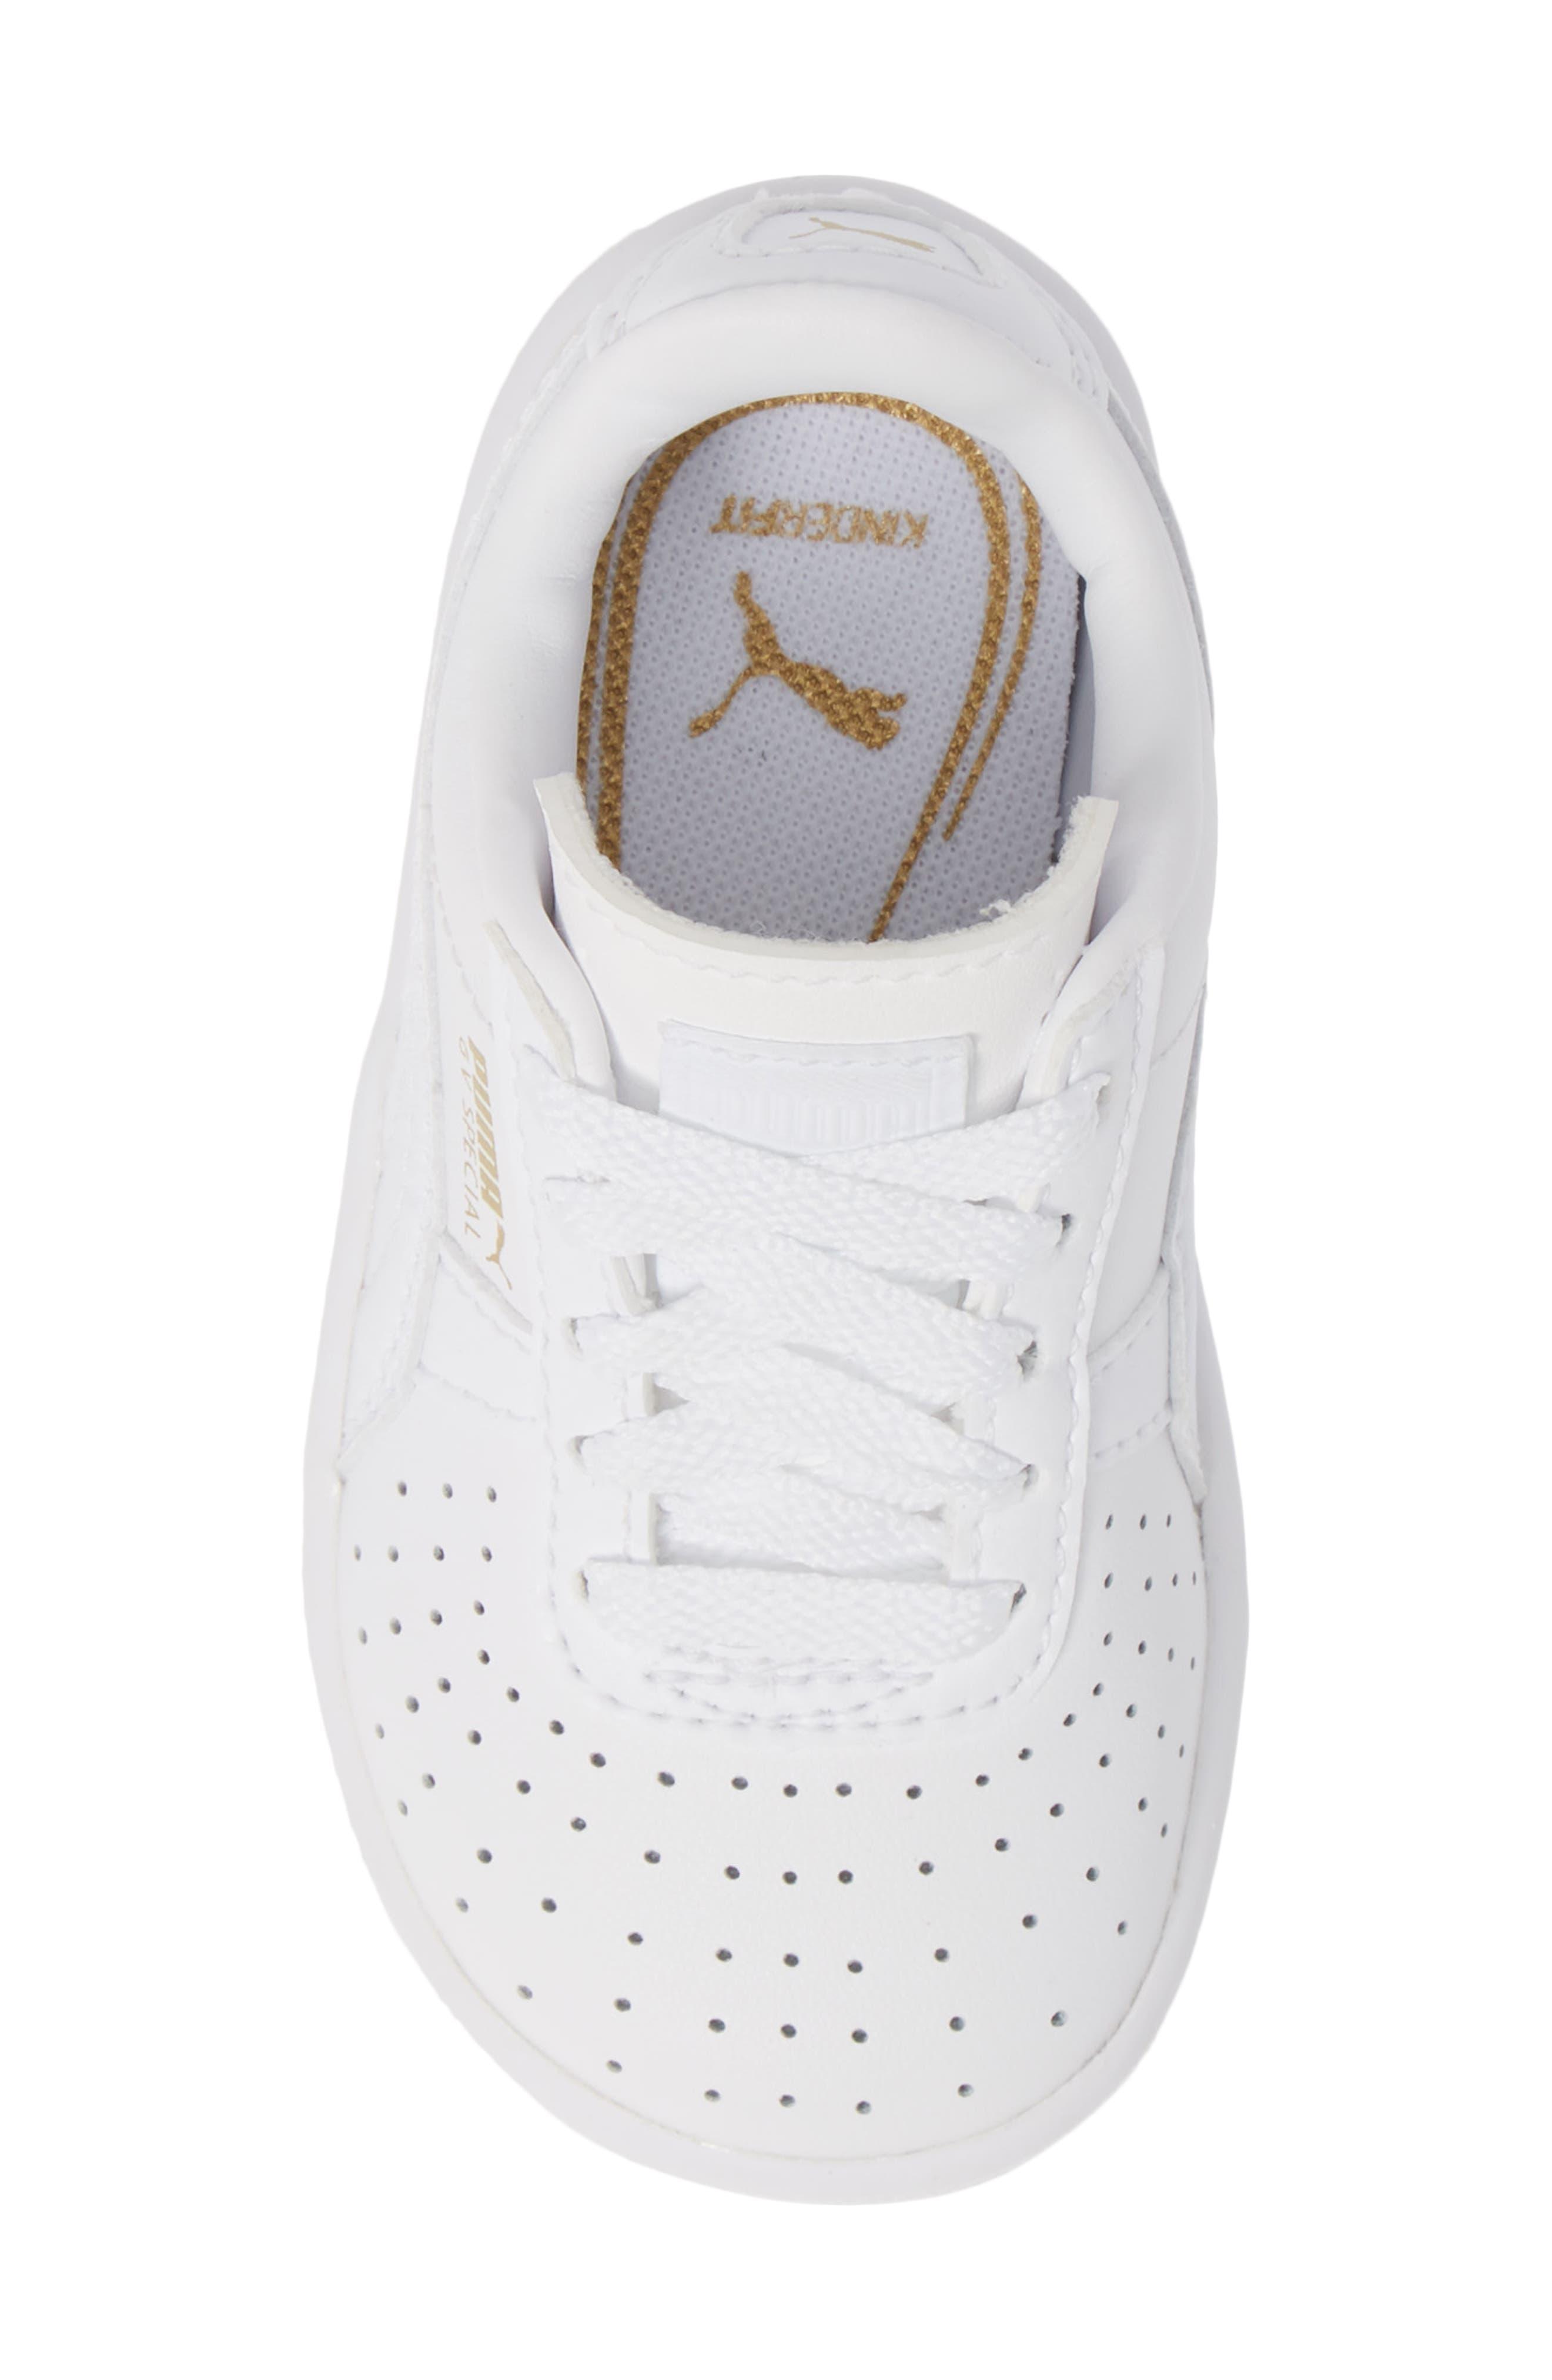 GV Special Sneaker,                             Alternate thumbnail 5, color,                             PUMA WHITE-PUMA TEAM GOLD